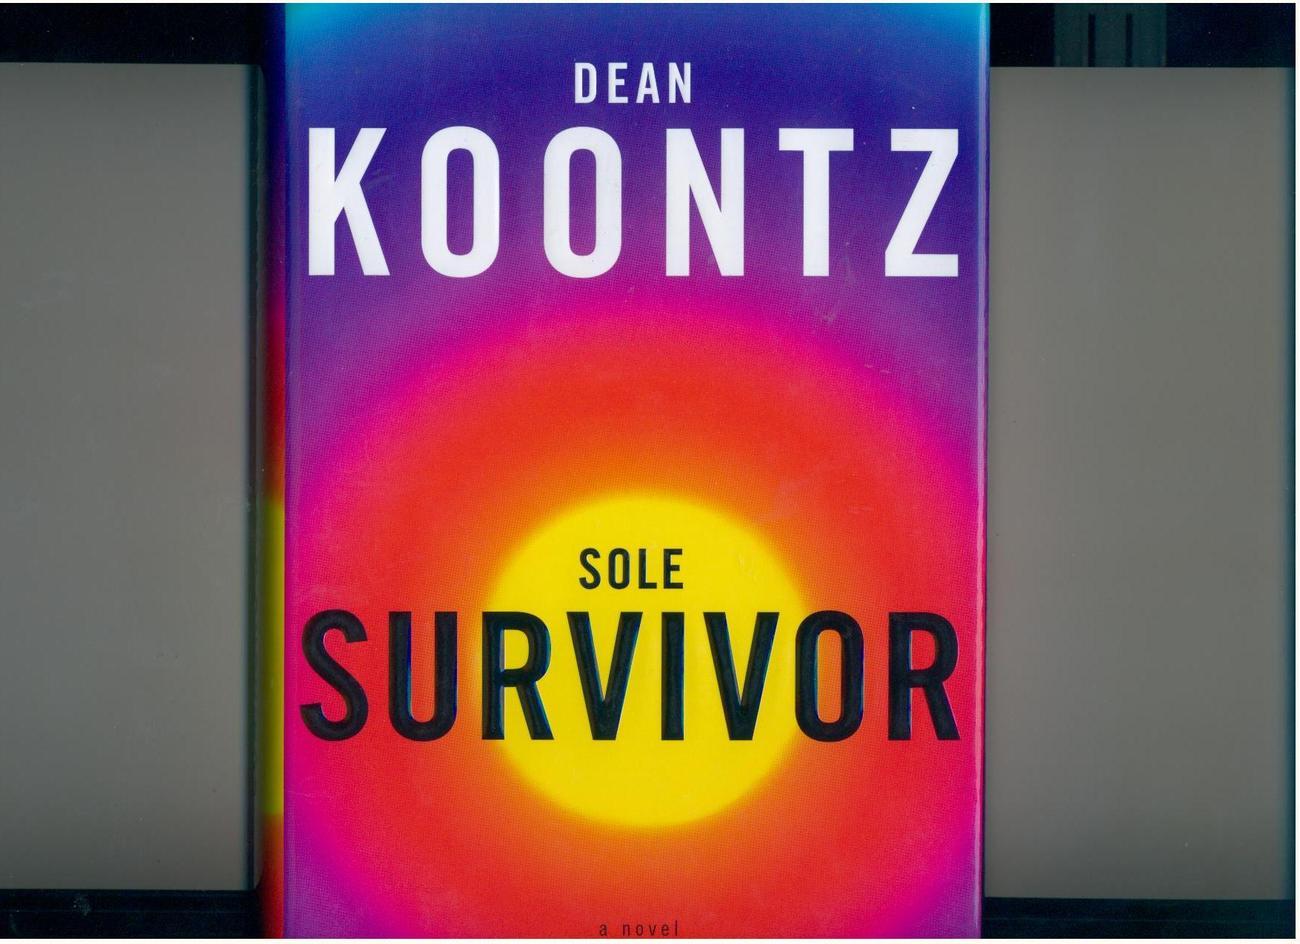 Koontz--SOLE SURVIVOR--hb/dj, 1st/1st--Like New